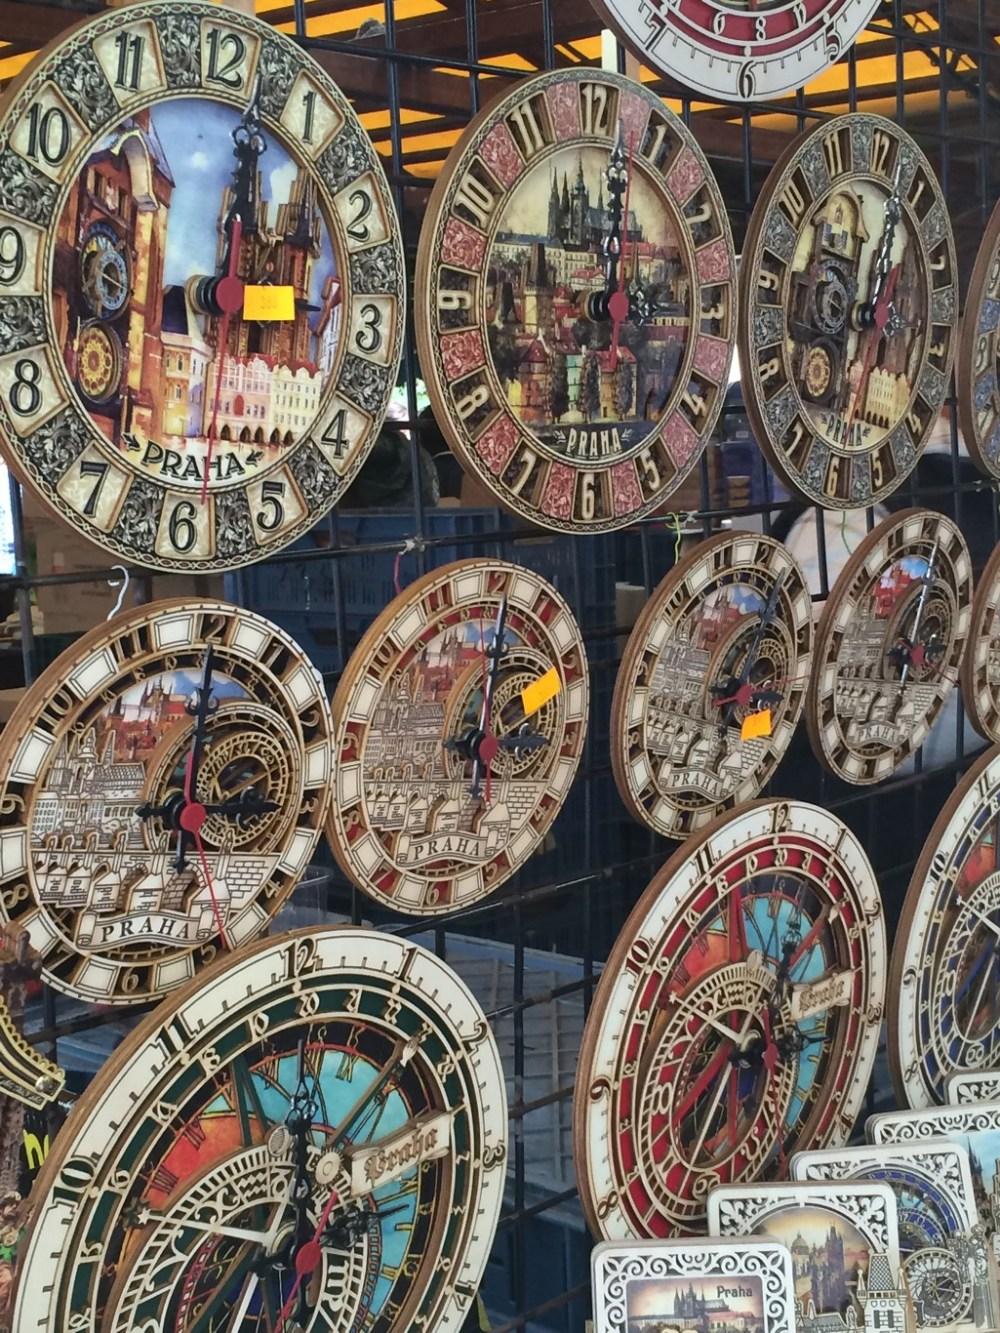 Offbeat Prague: Funky souvenir clocks at the Havelska souvenir market